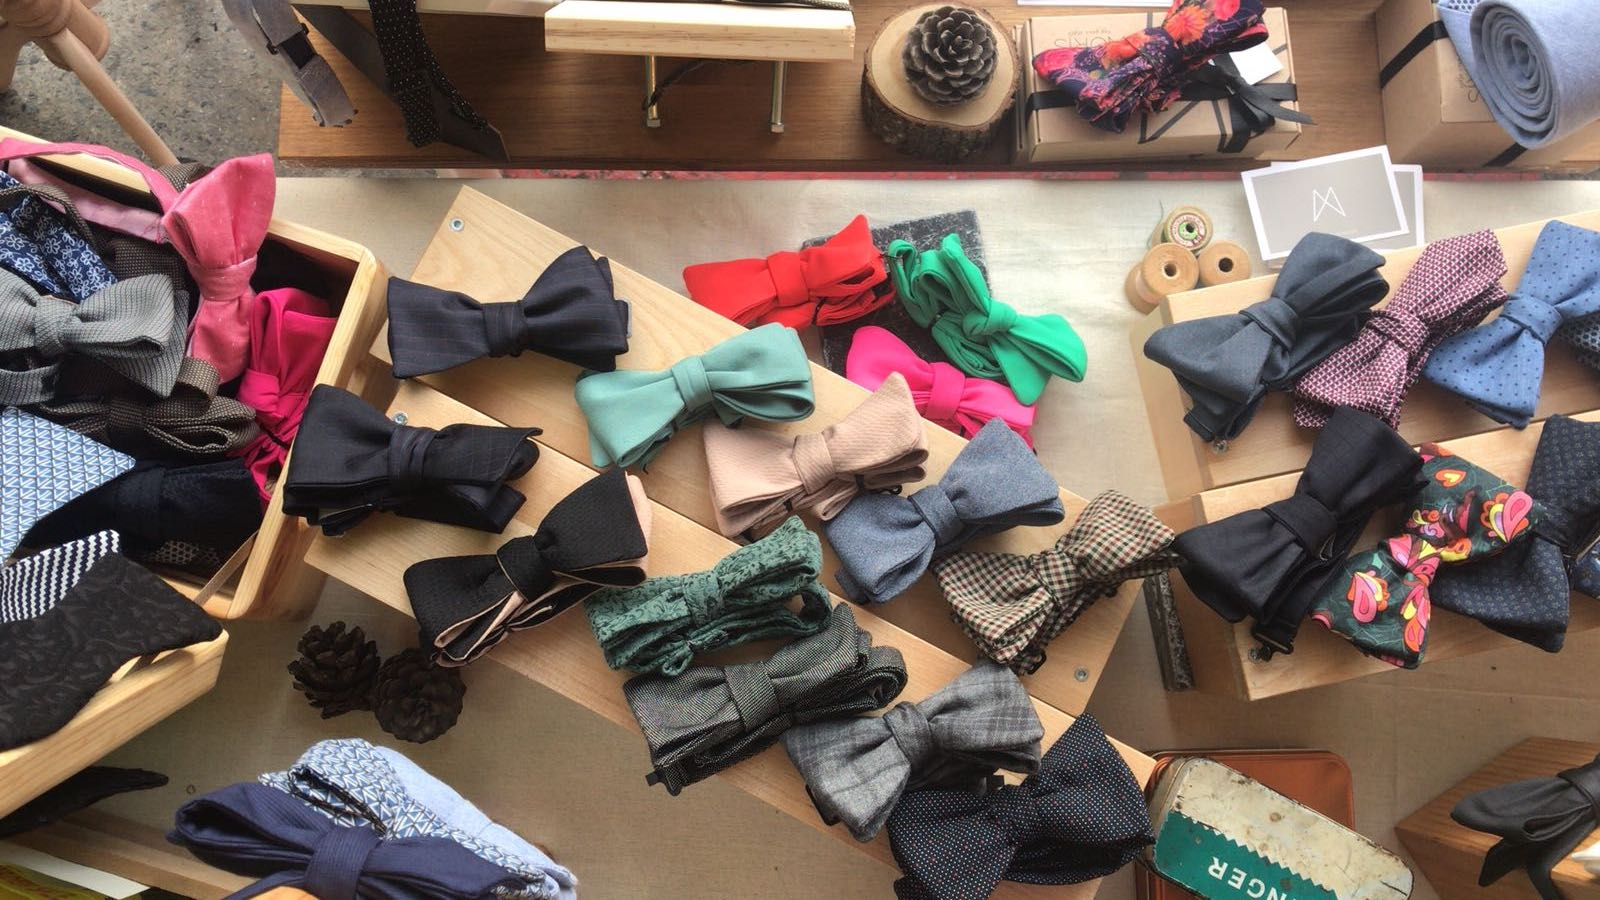 Morisstore, bağlamalı desenli papyon, kravat, çocuk papyonu, papyon kravat modelleri